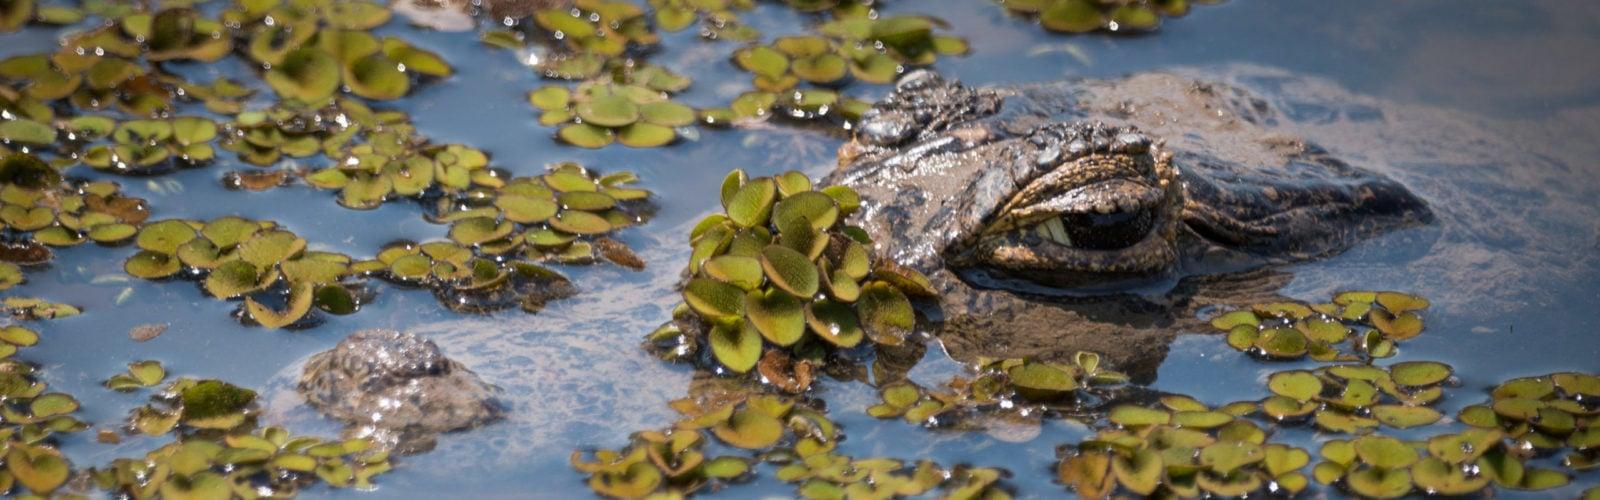 pantanal-alligator-brazil